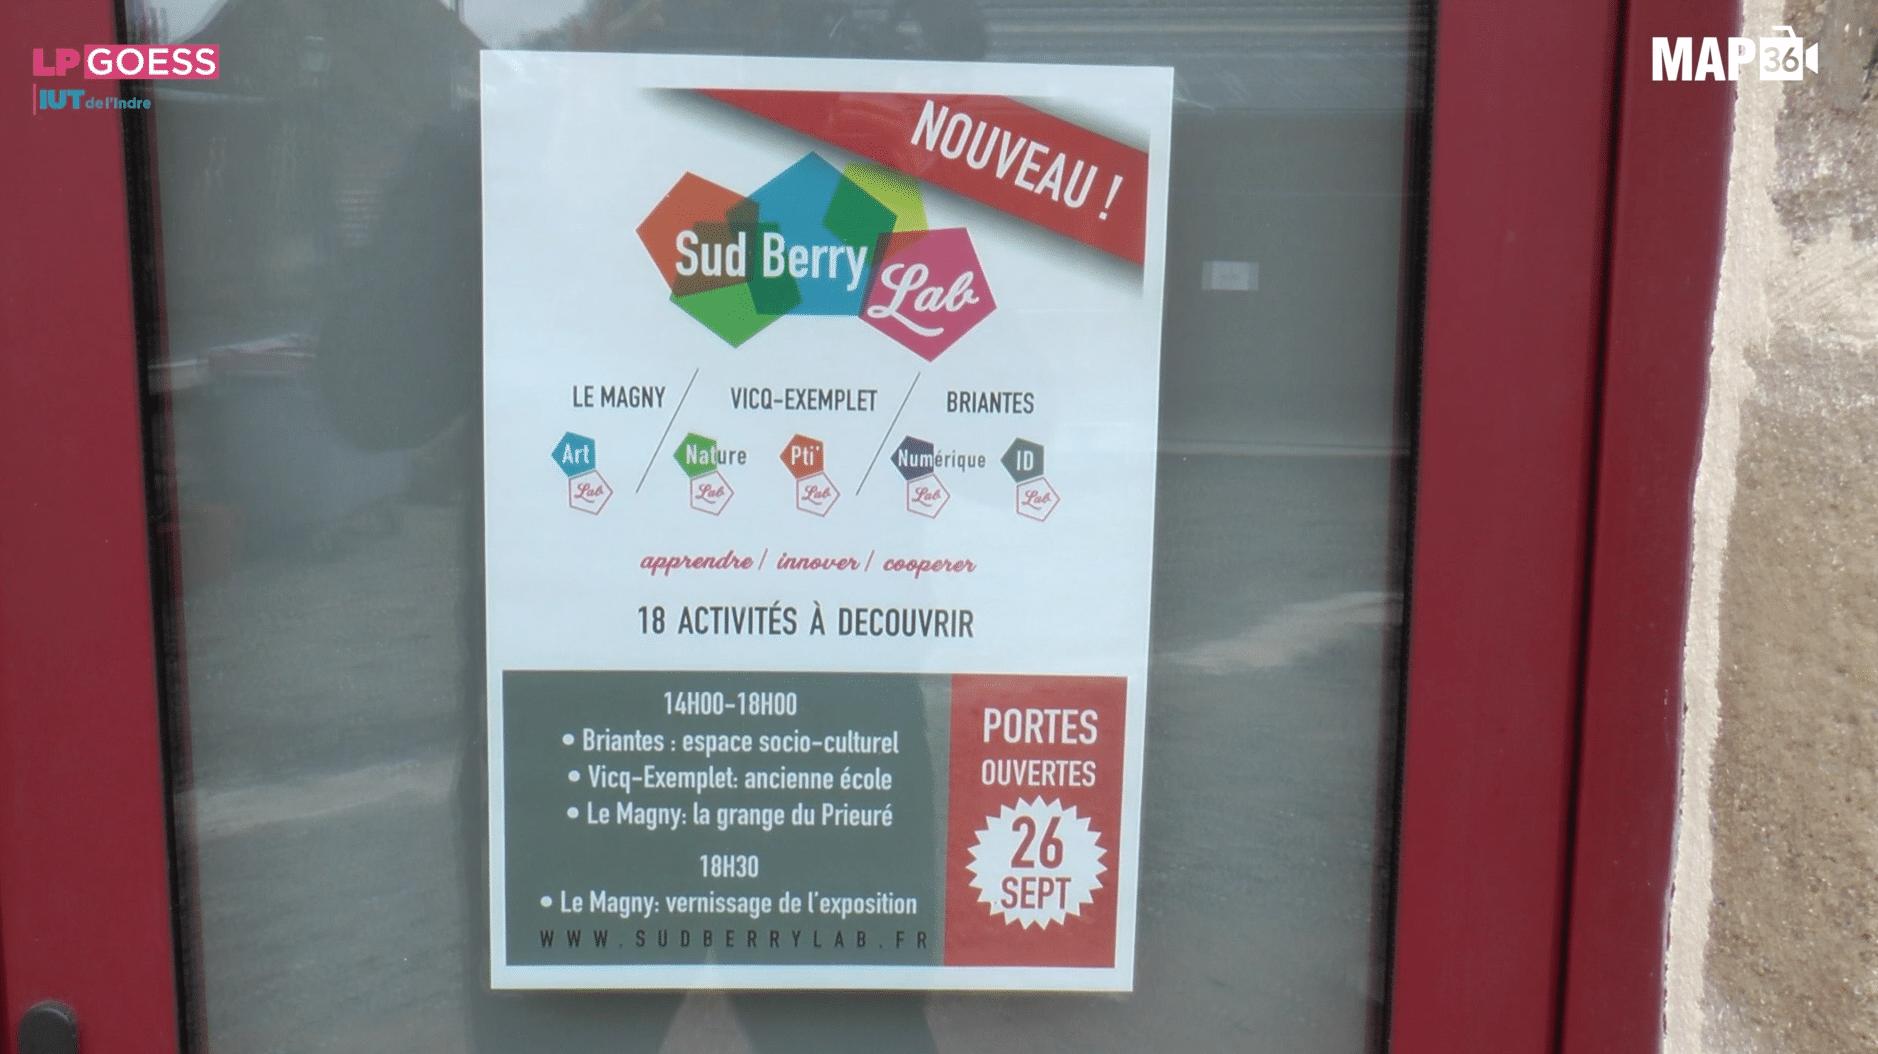 Sud Berry Lab